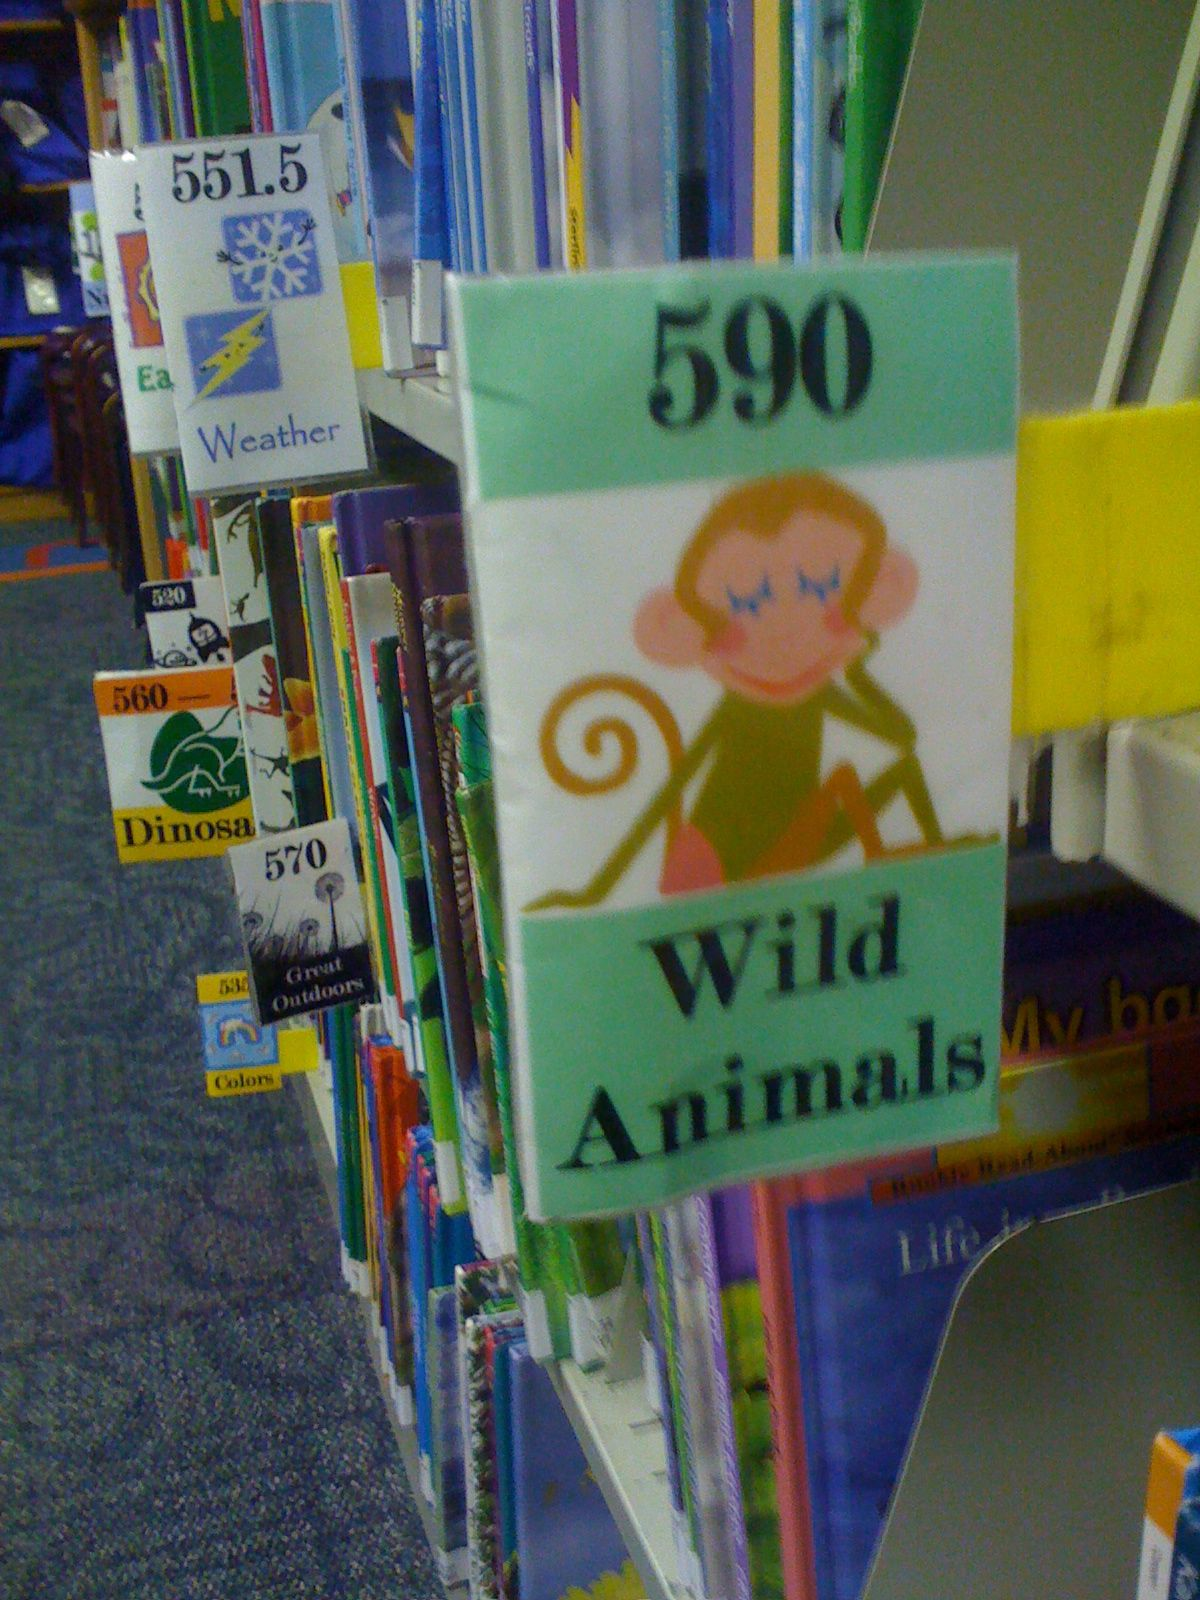 Demco.com - Library Shelf Markers | Books | Pinterest | Markers ...